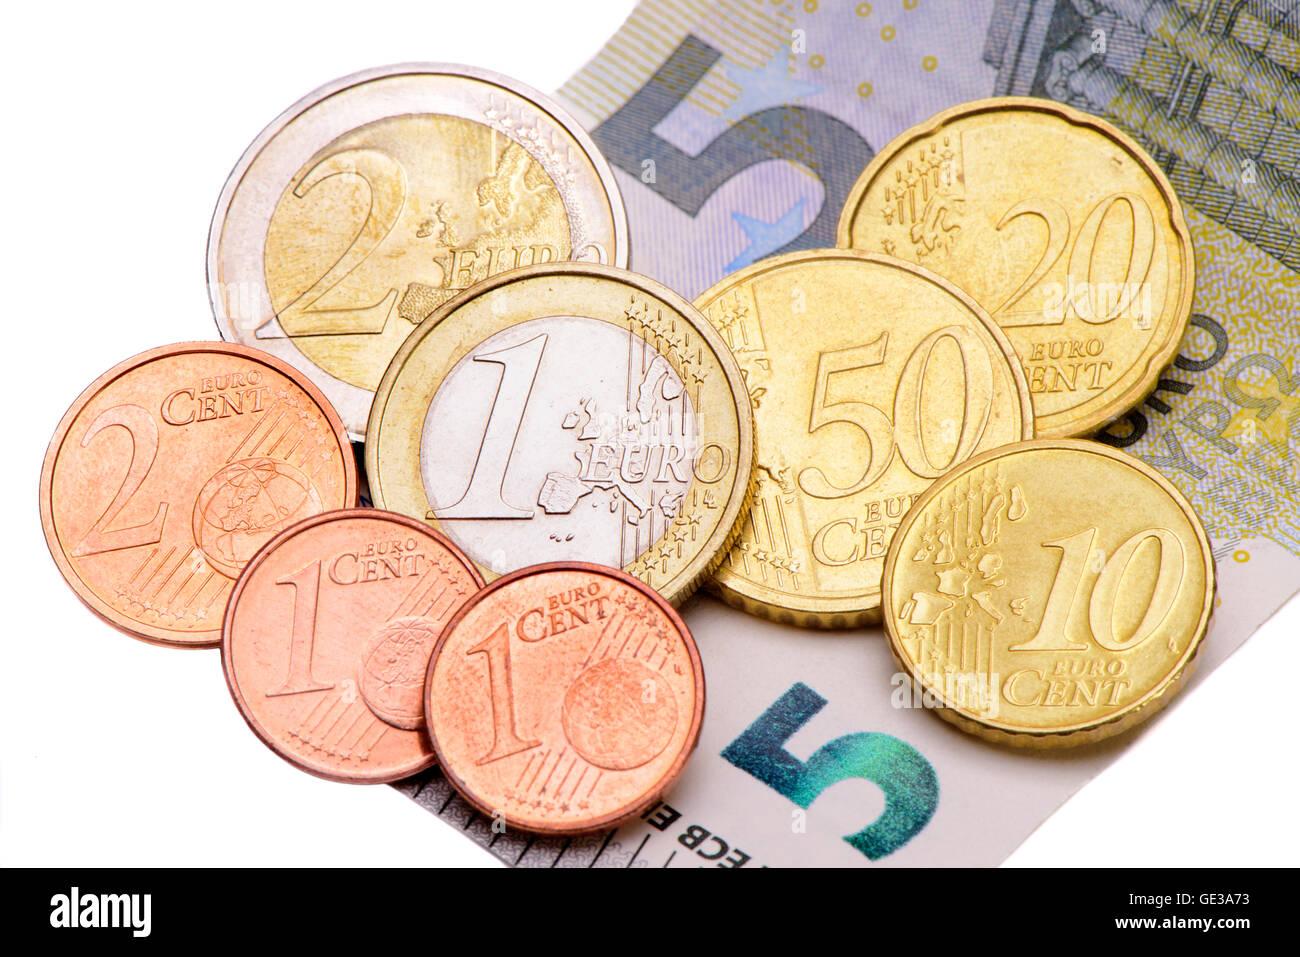 8,84 Euro minimum wage in Germany - Stock Image